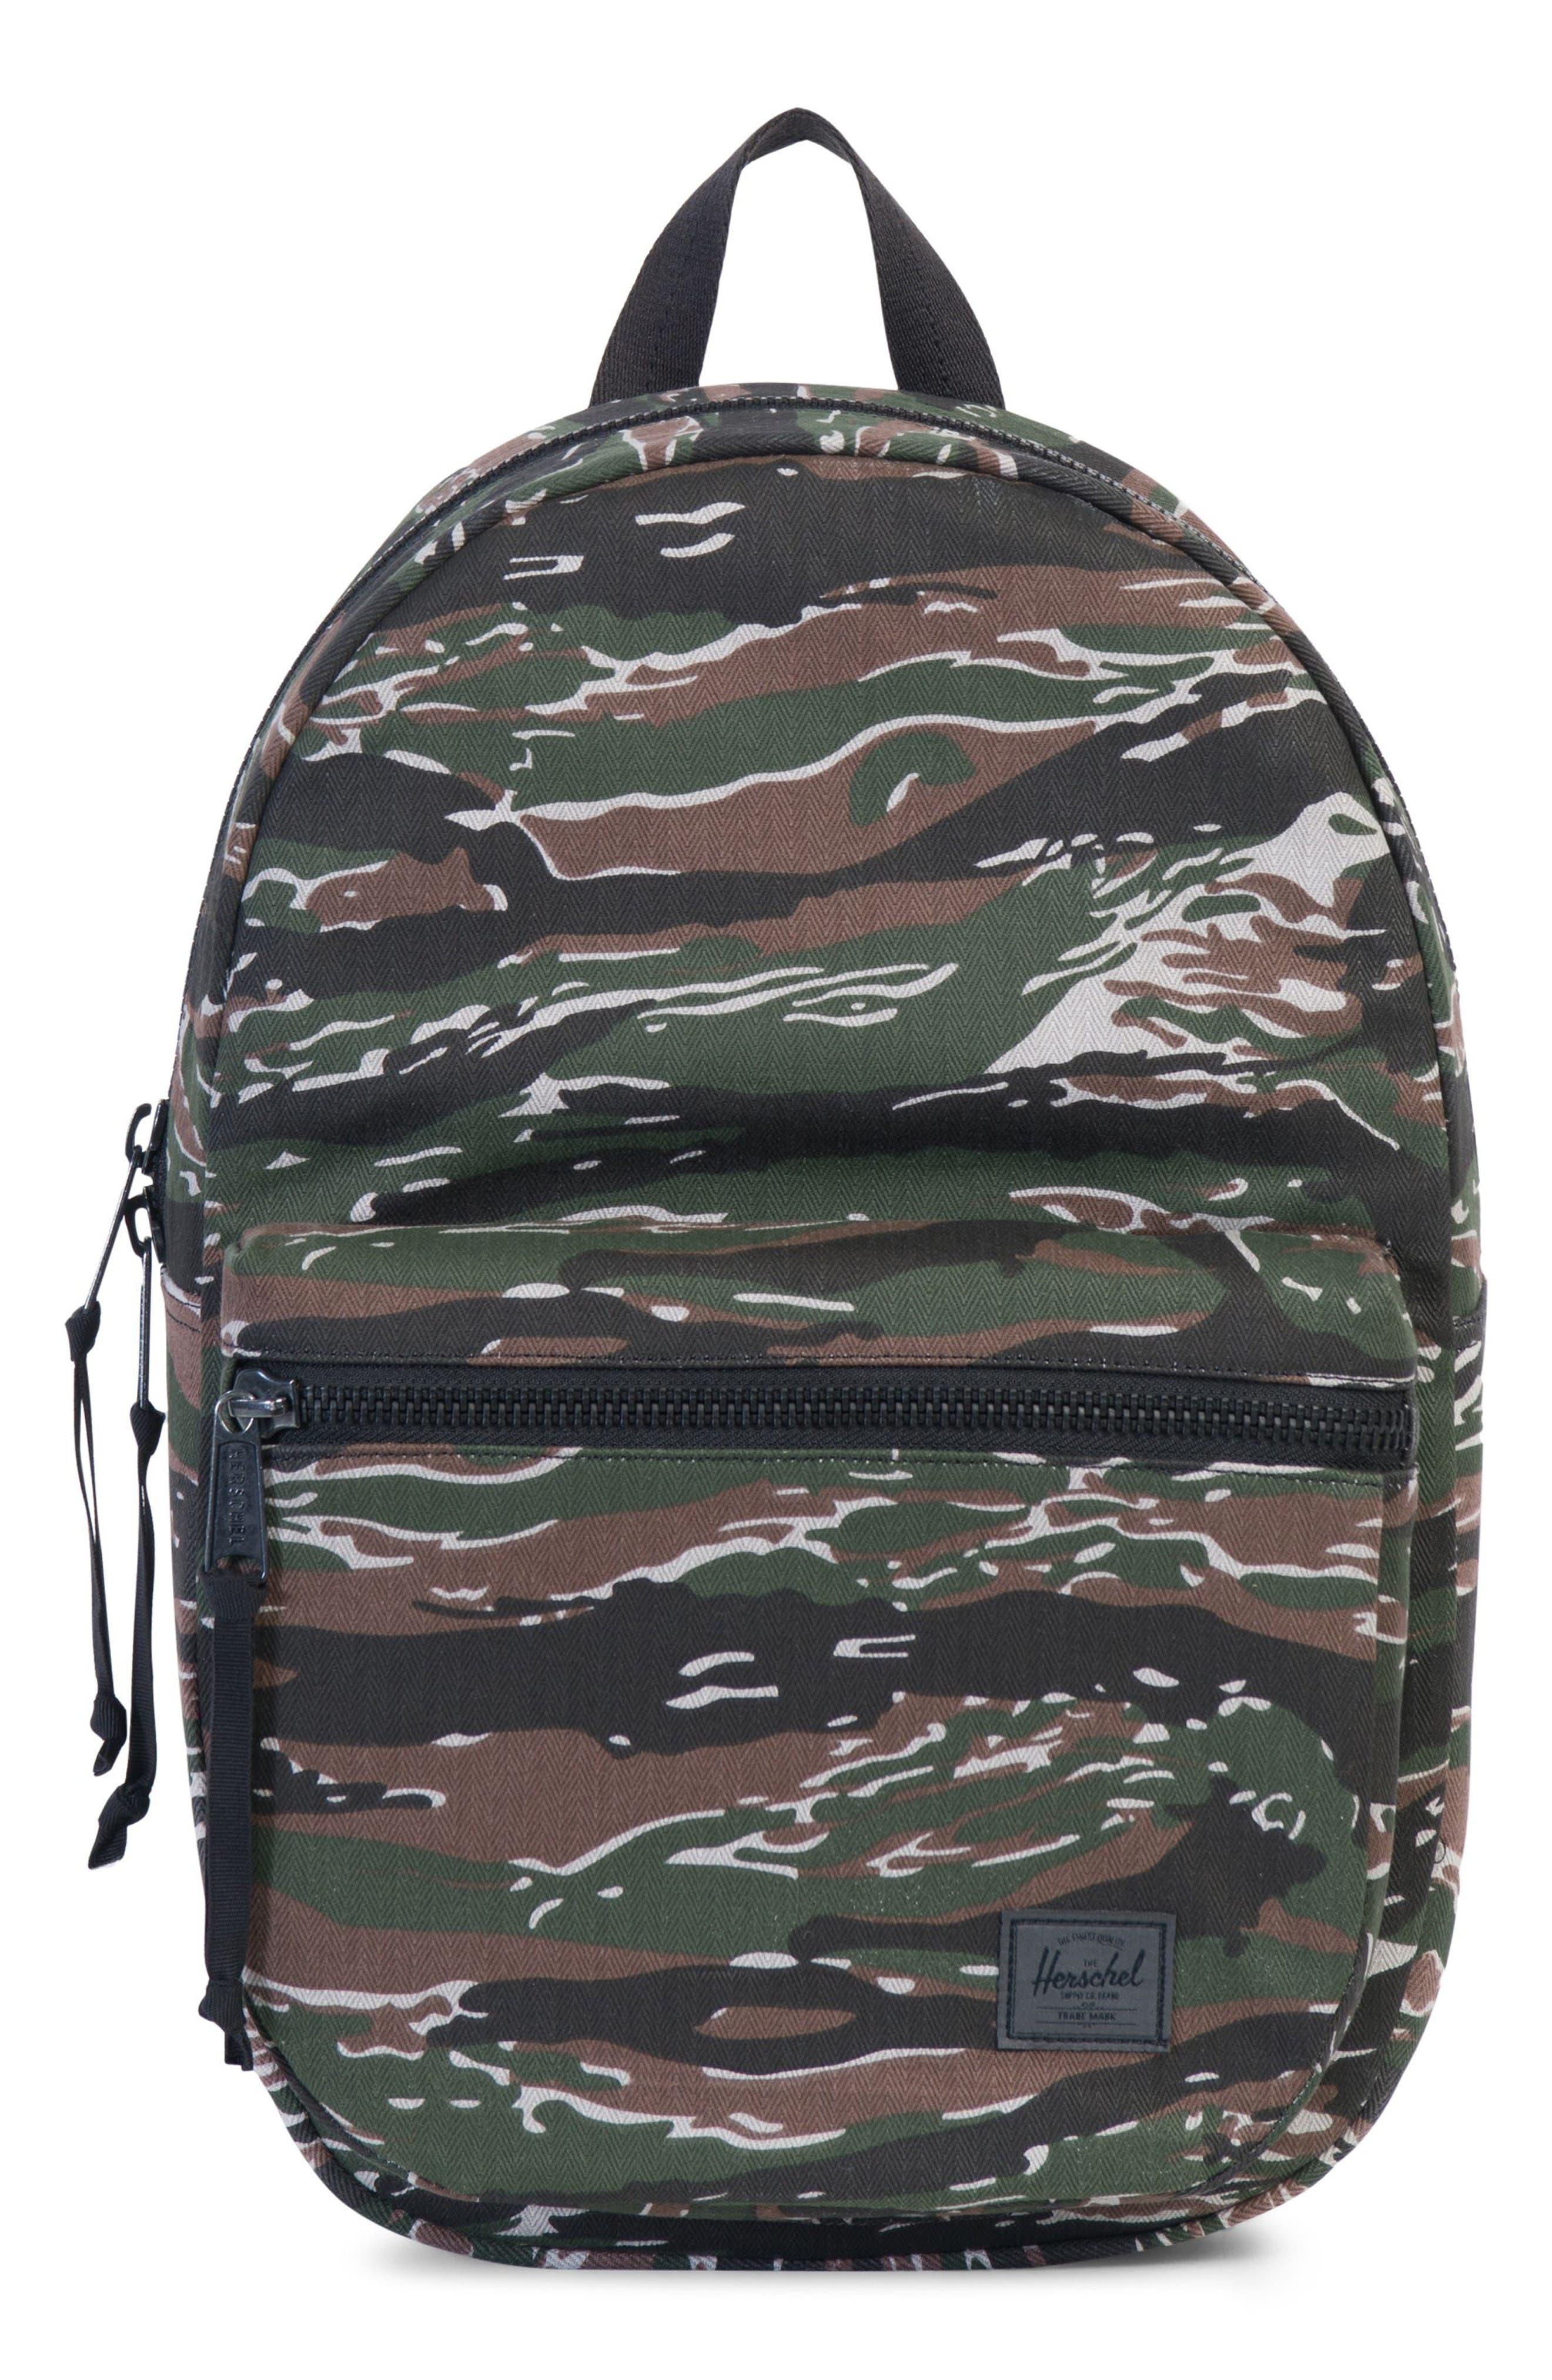 Herschel Supply Co. Lawson Surplus Backpack